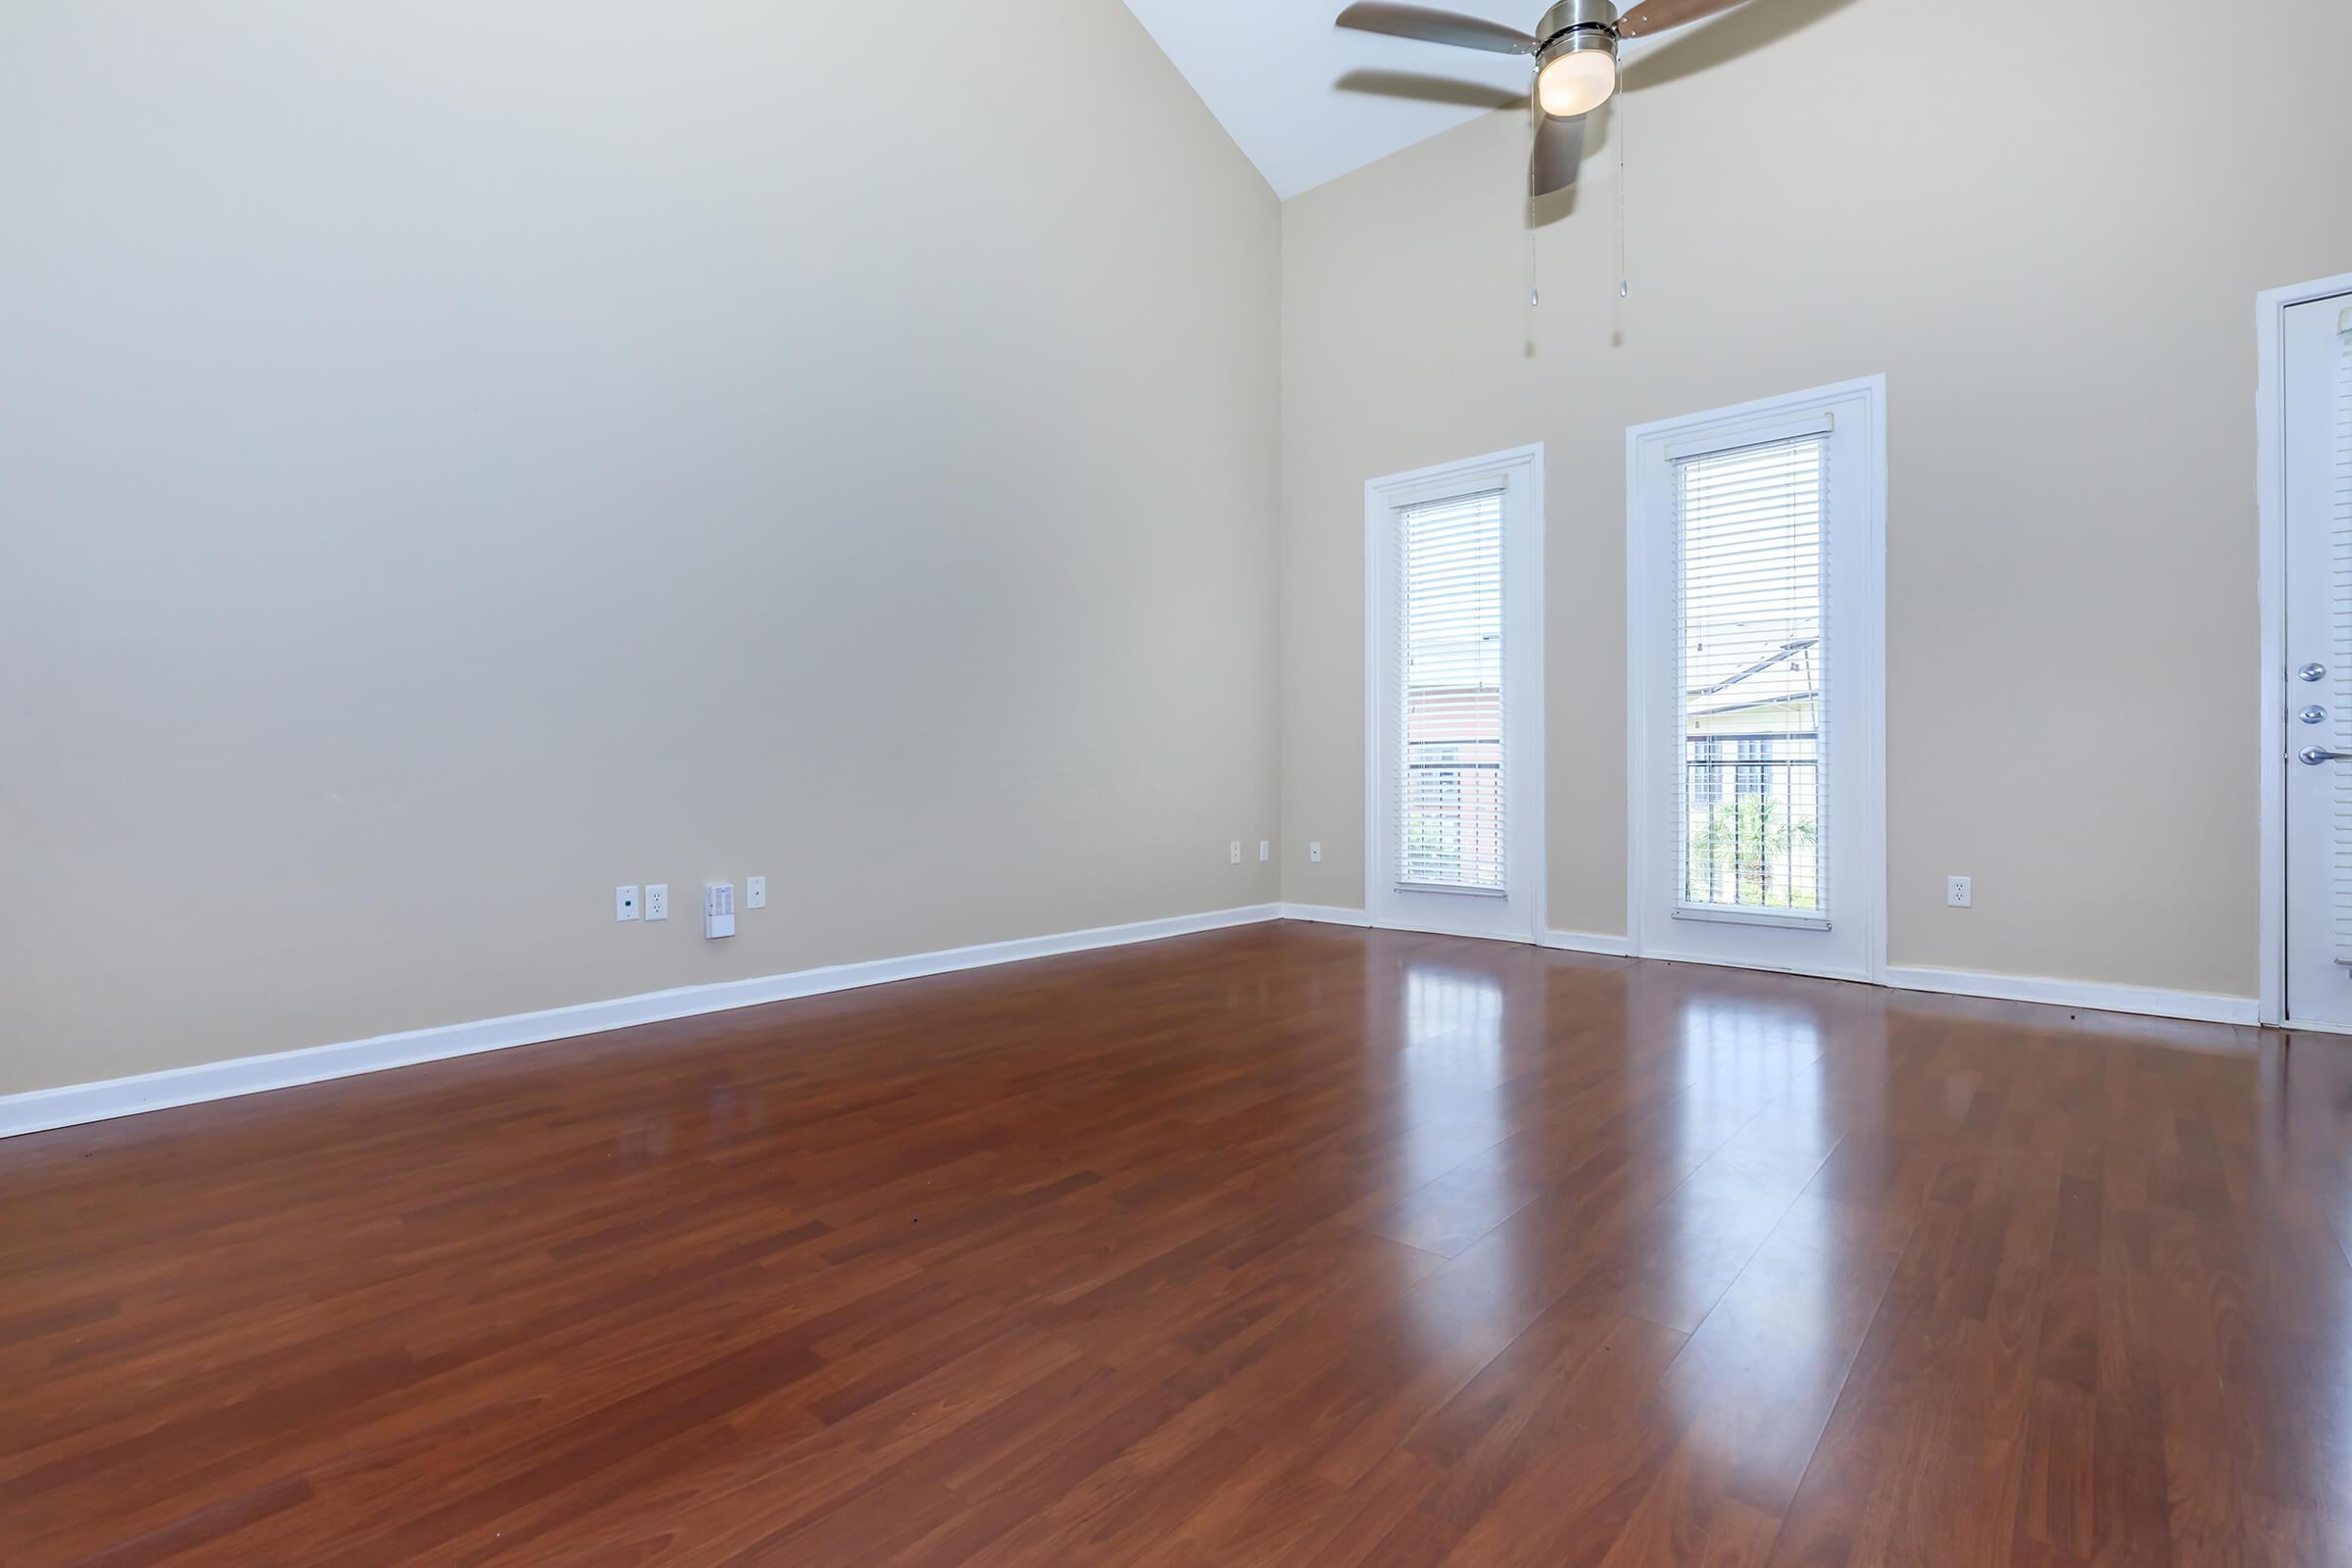 a screen shot of a hard wood floor